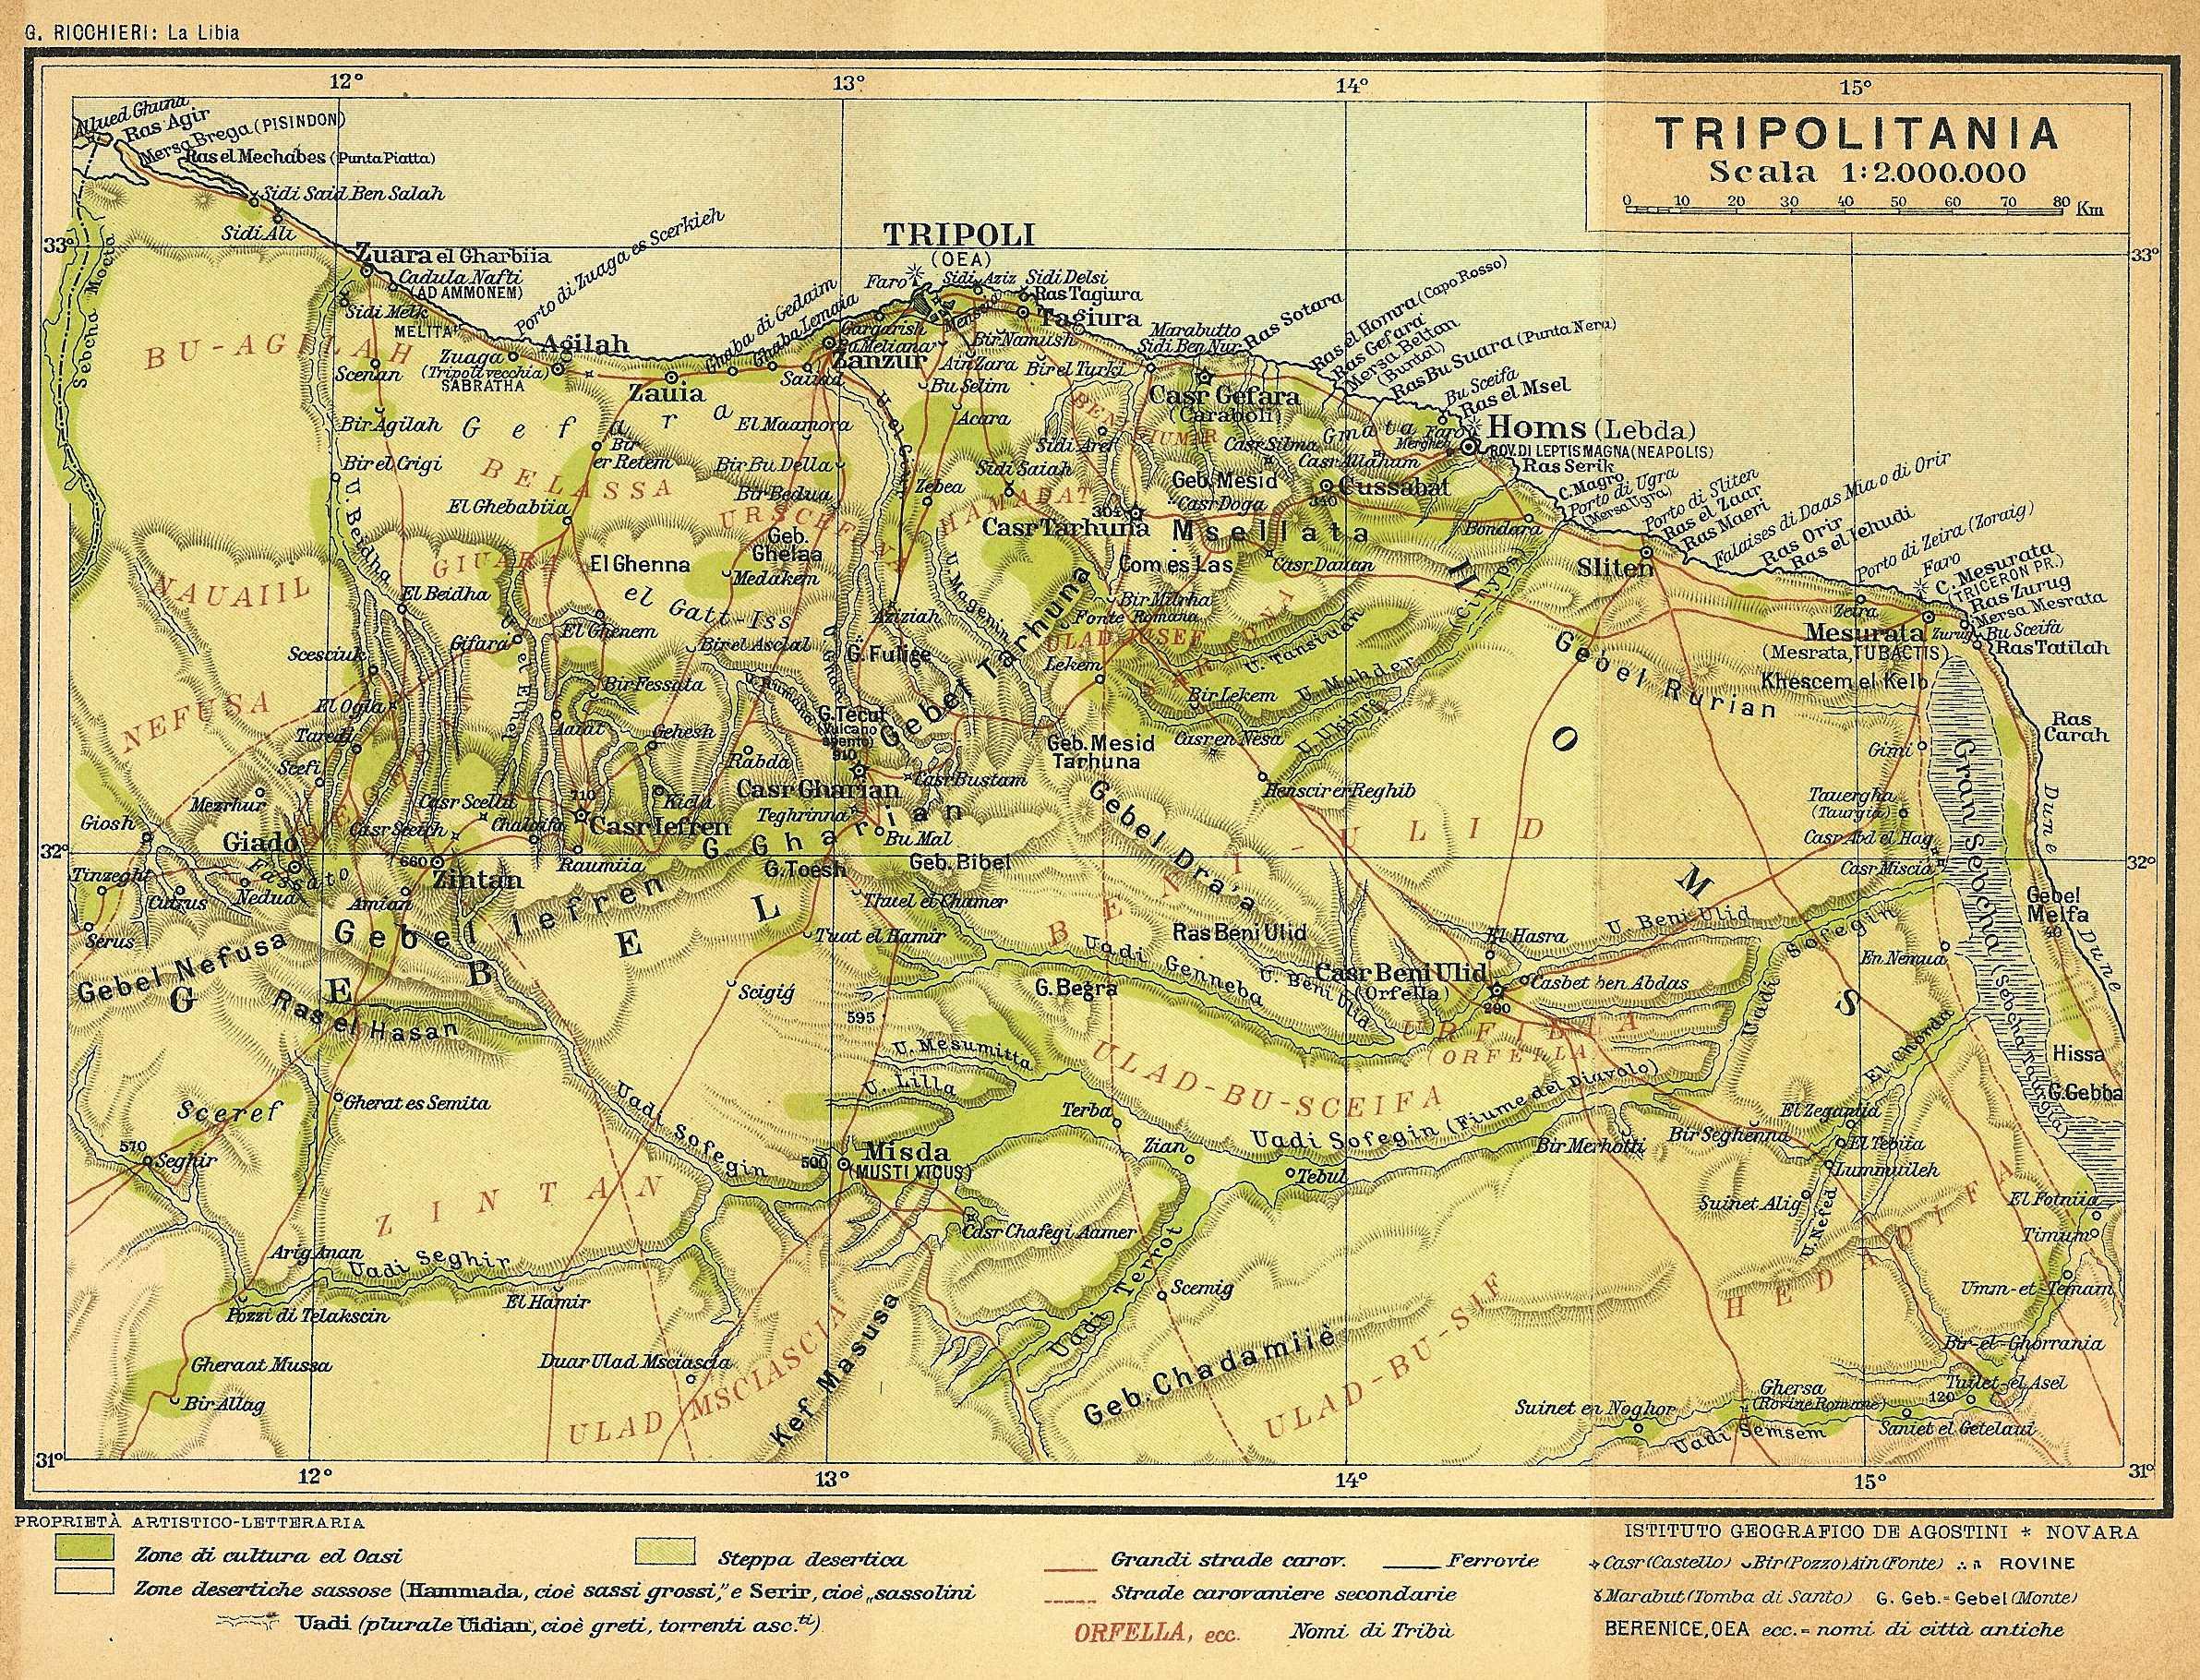 Image:Tripolitania